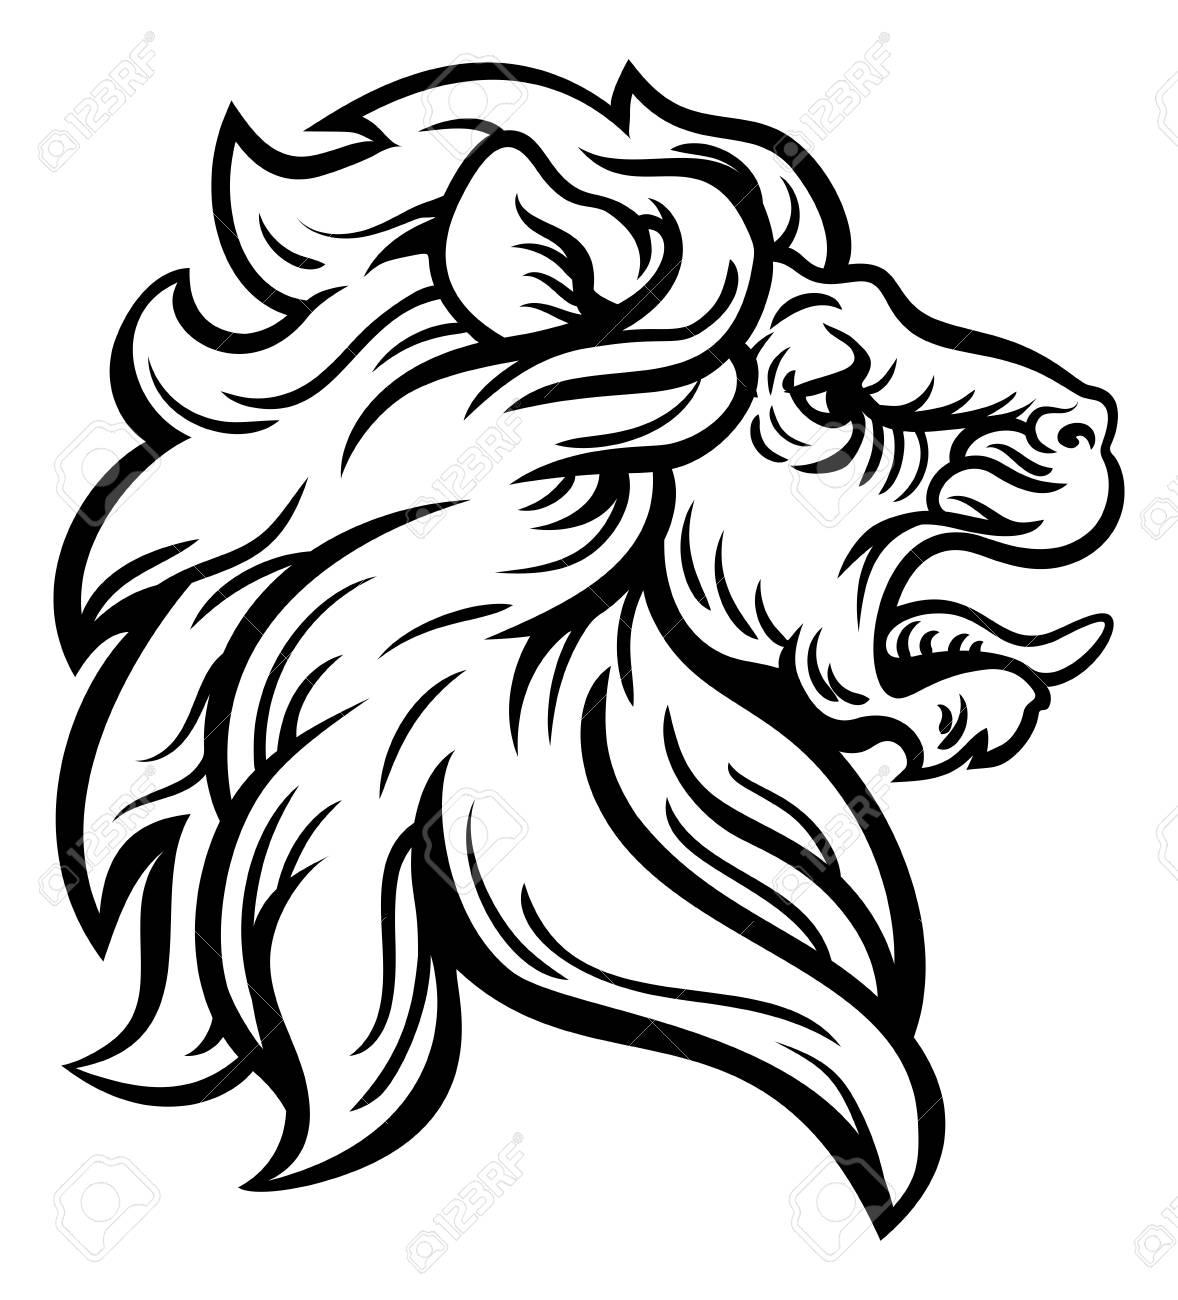 1178x1300 Woodcut Lion Head Profile Concept Royalty Free Cliparts, Vectors